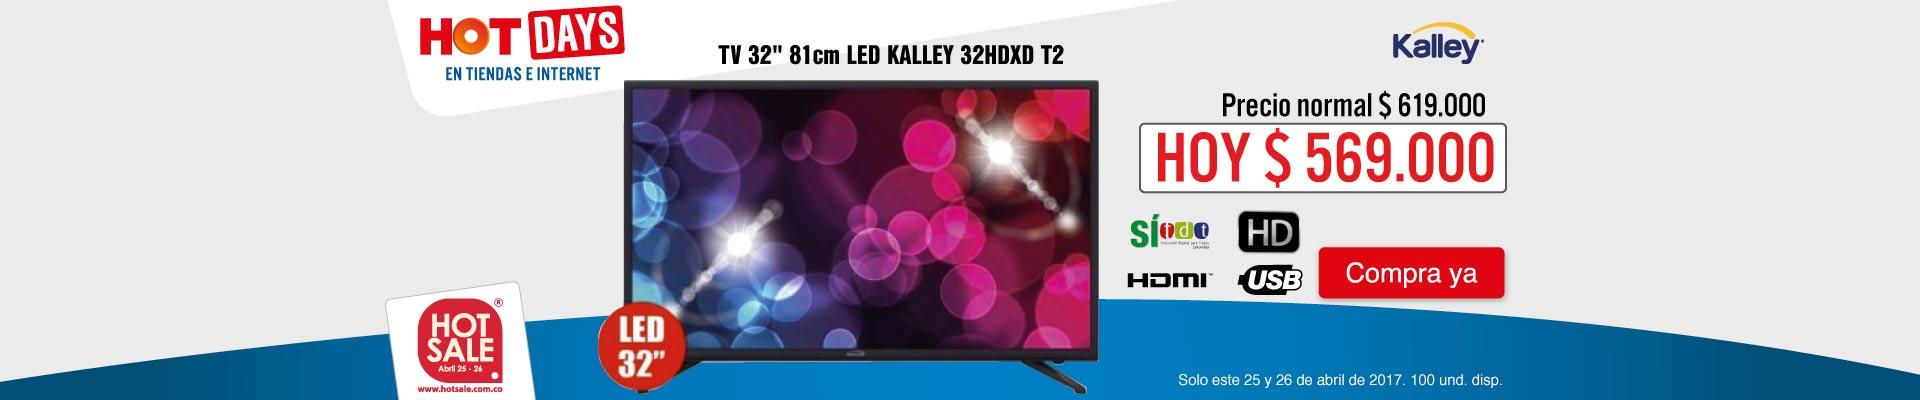 PPAL KT - TV Kalley 32HDXD - ABR 25 HotSale